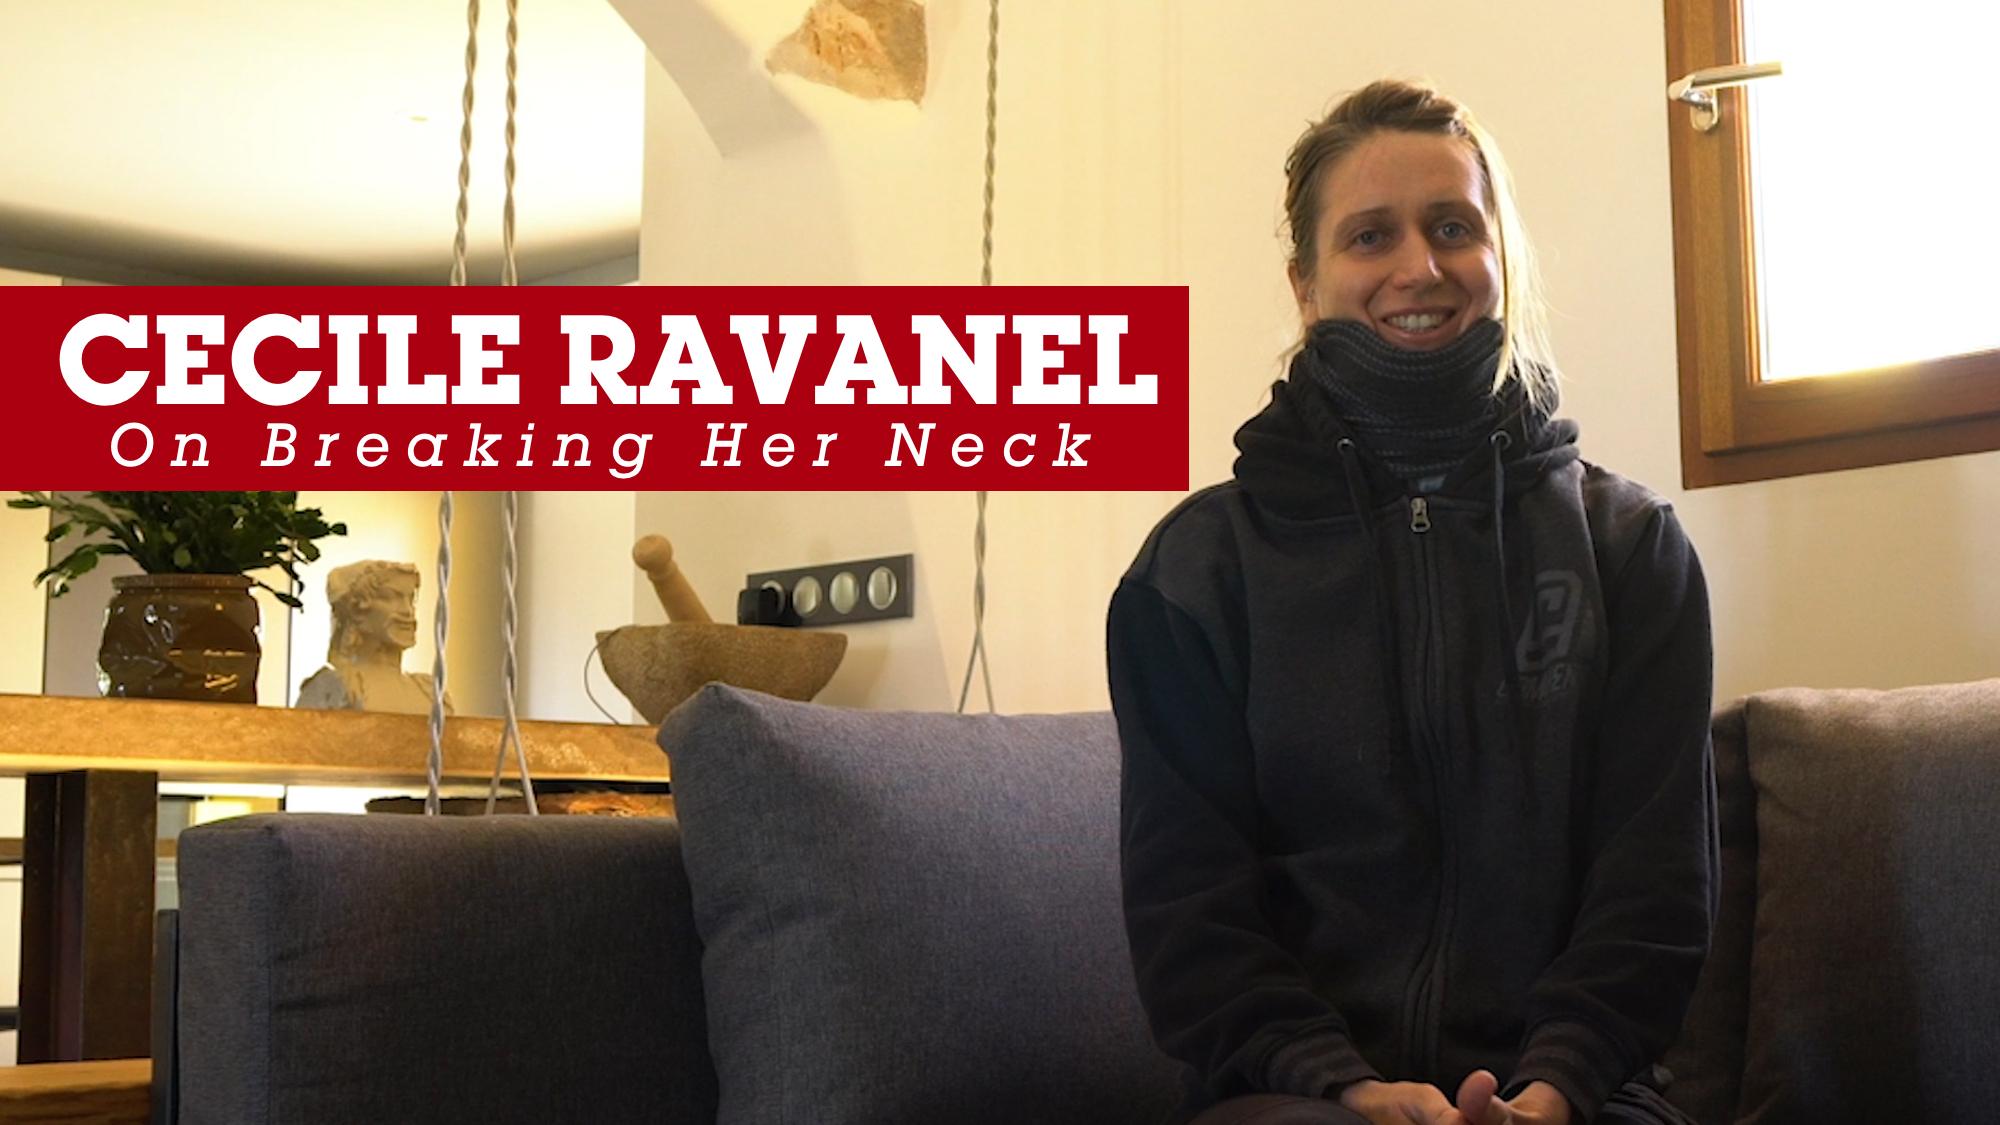 On Breaking Her Neck - Cecile Ravanel Exclusive Interview